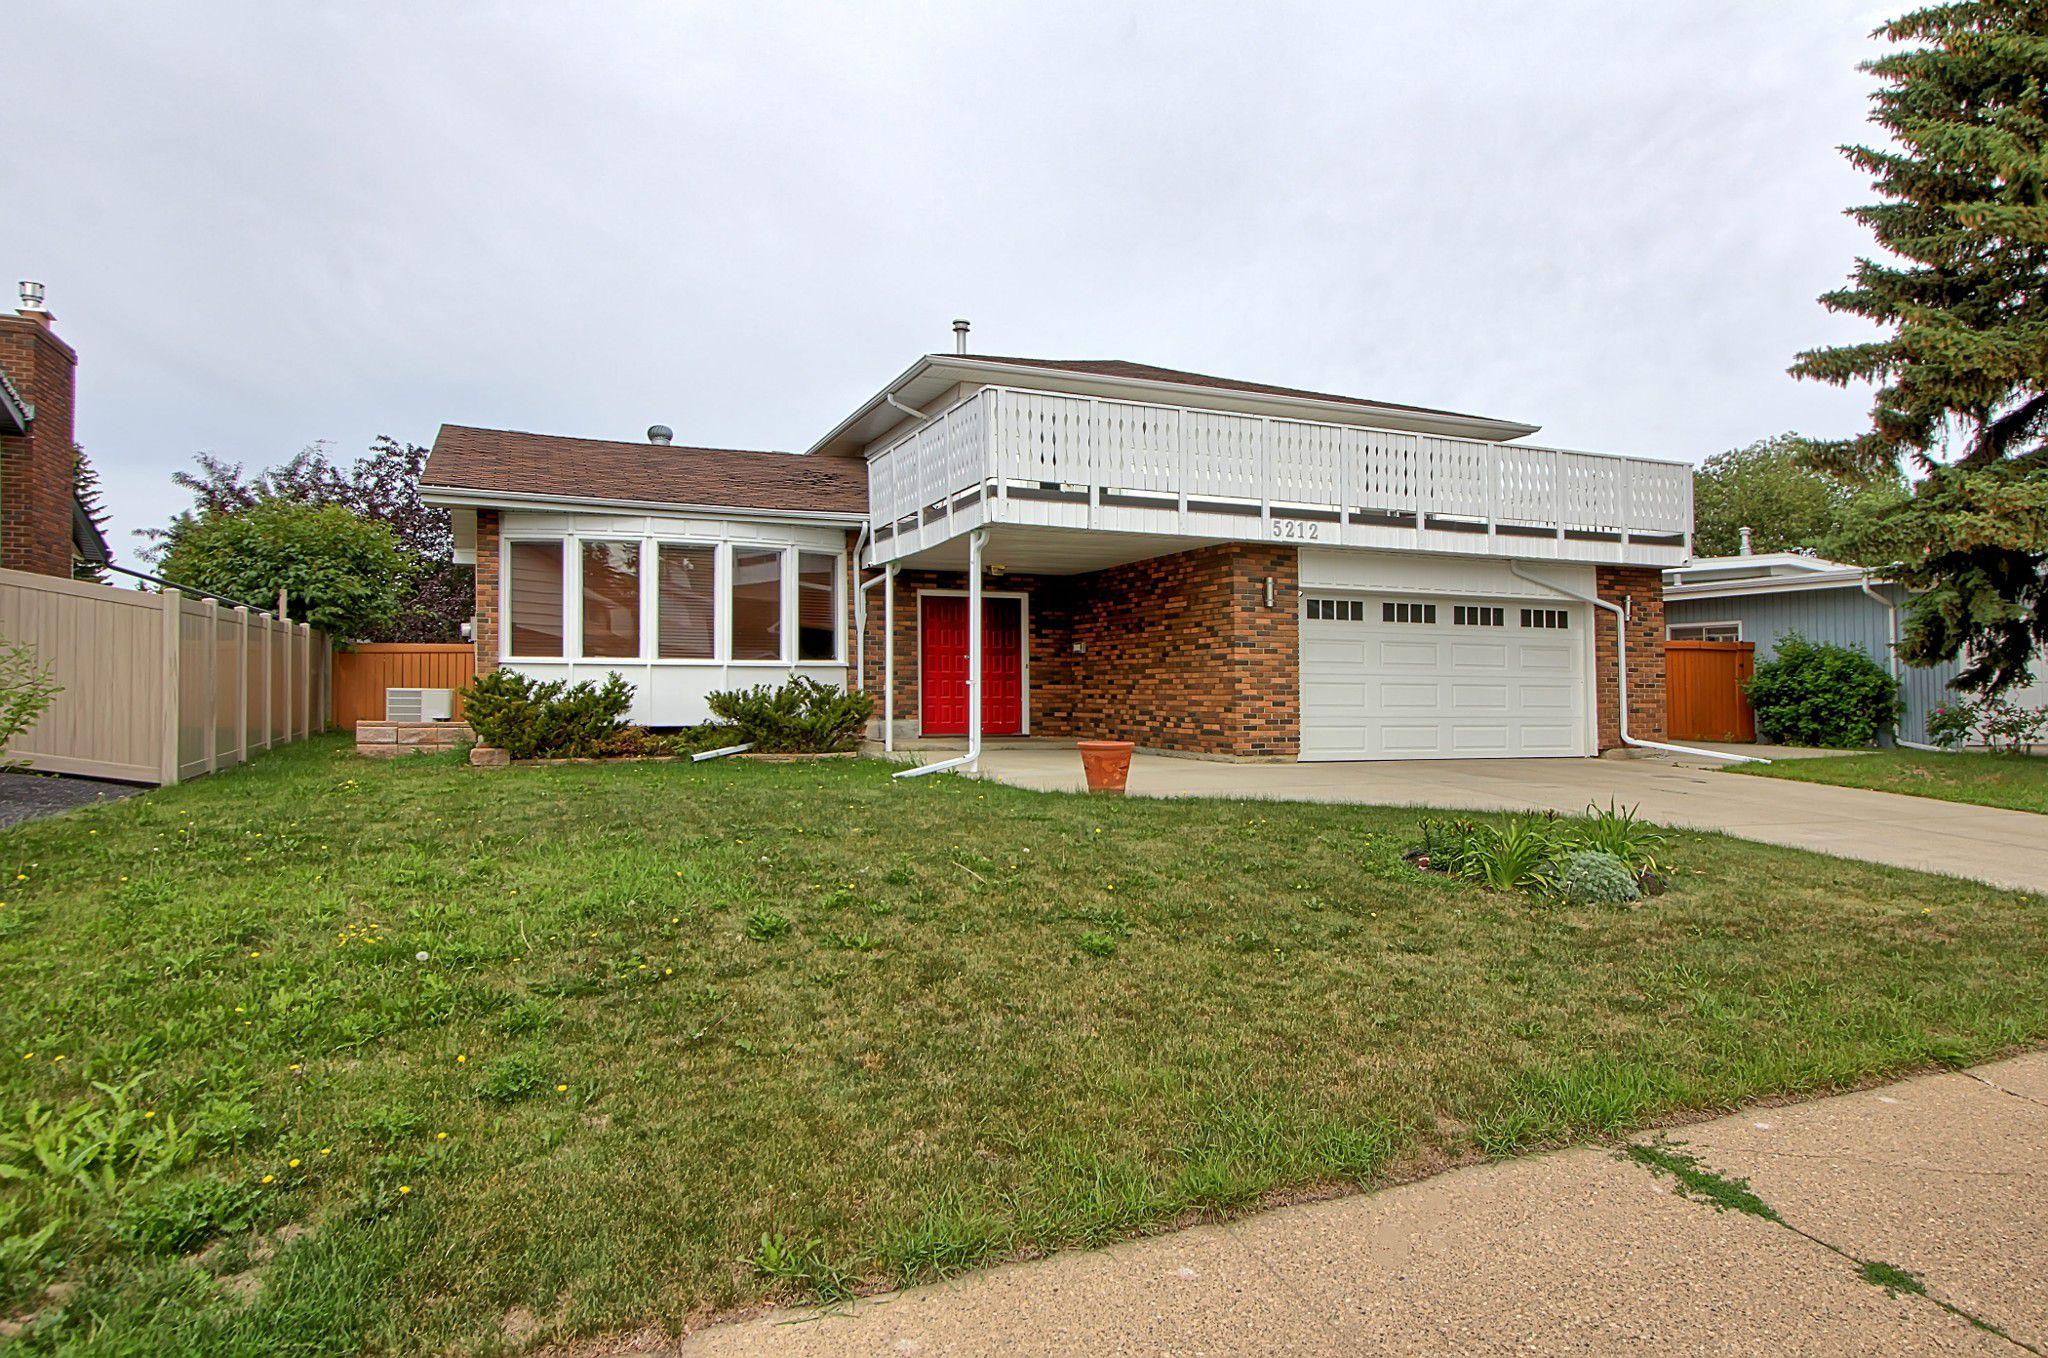 Main Photo: 5212 142 Street in Edmonton: House for sale